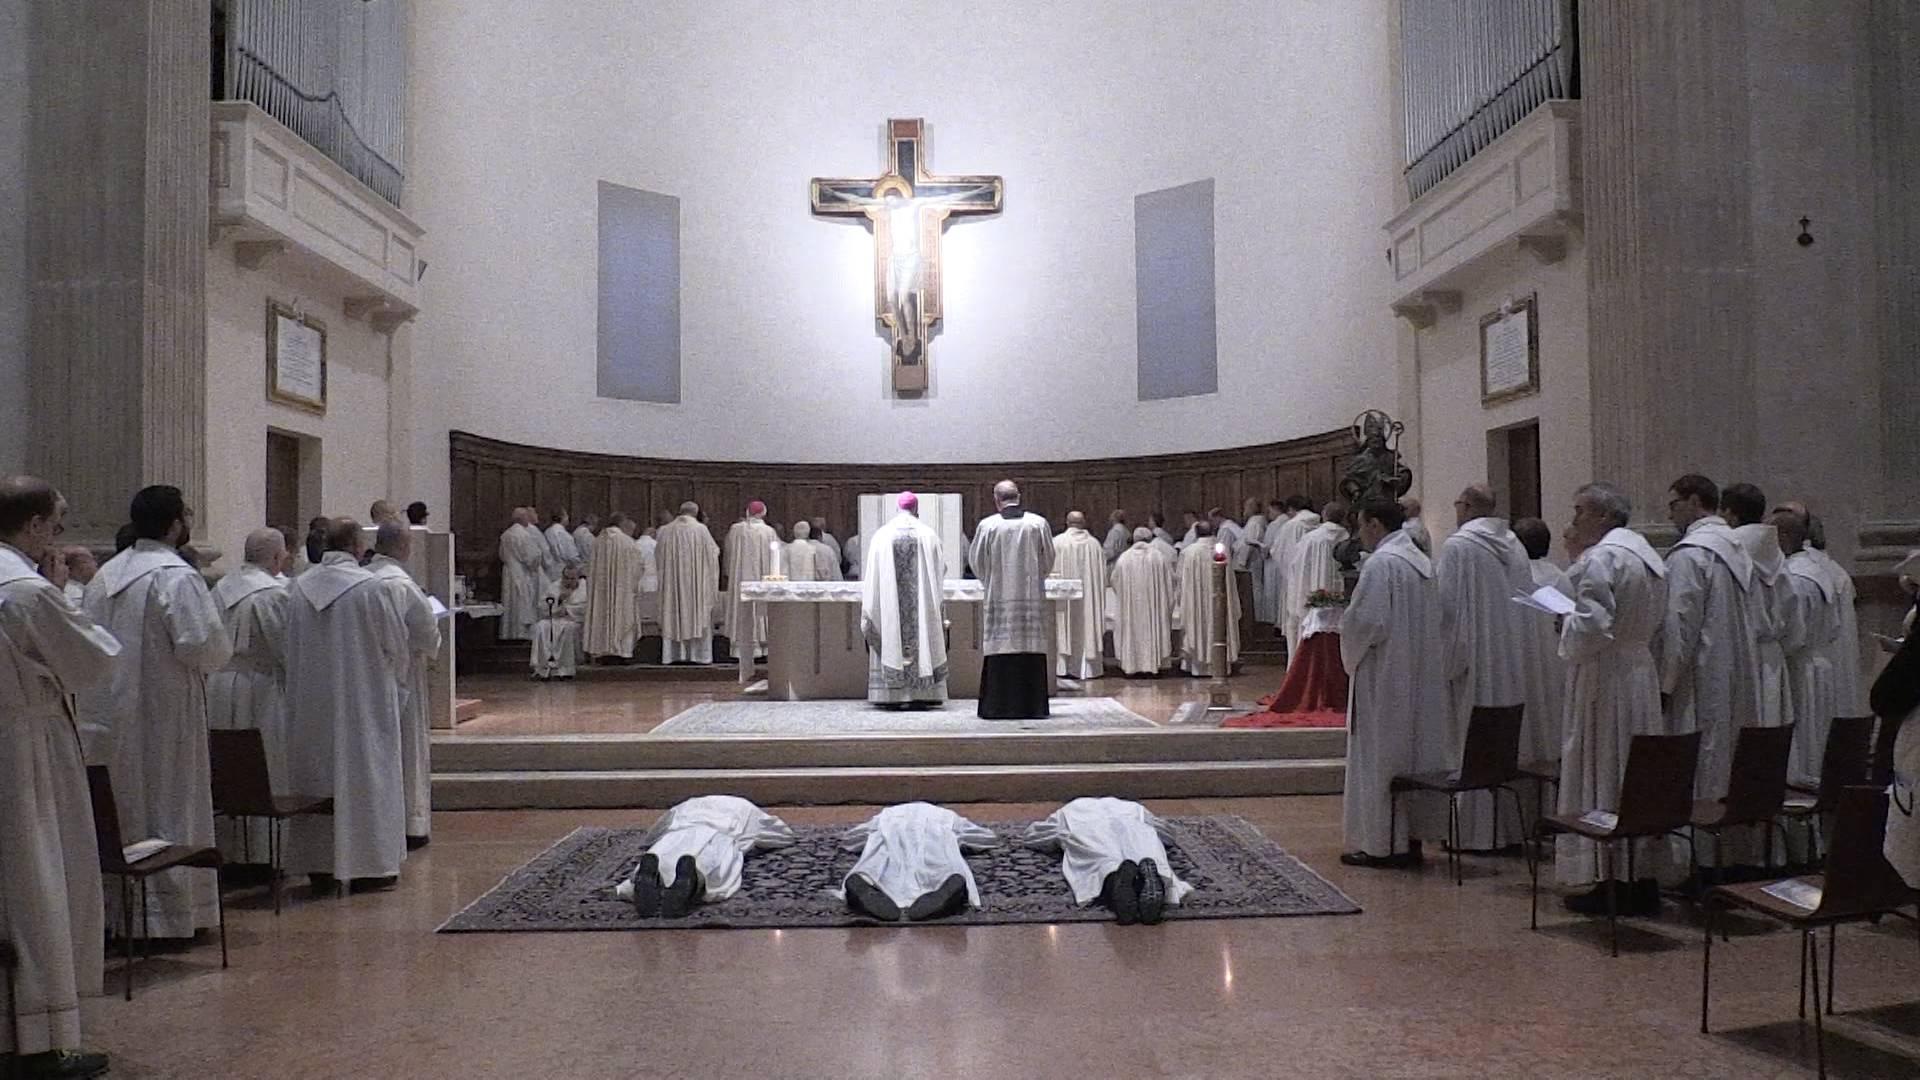 Domenica in Basilica l'ordinazione di dieci diaconi